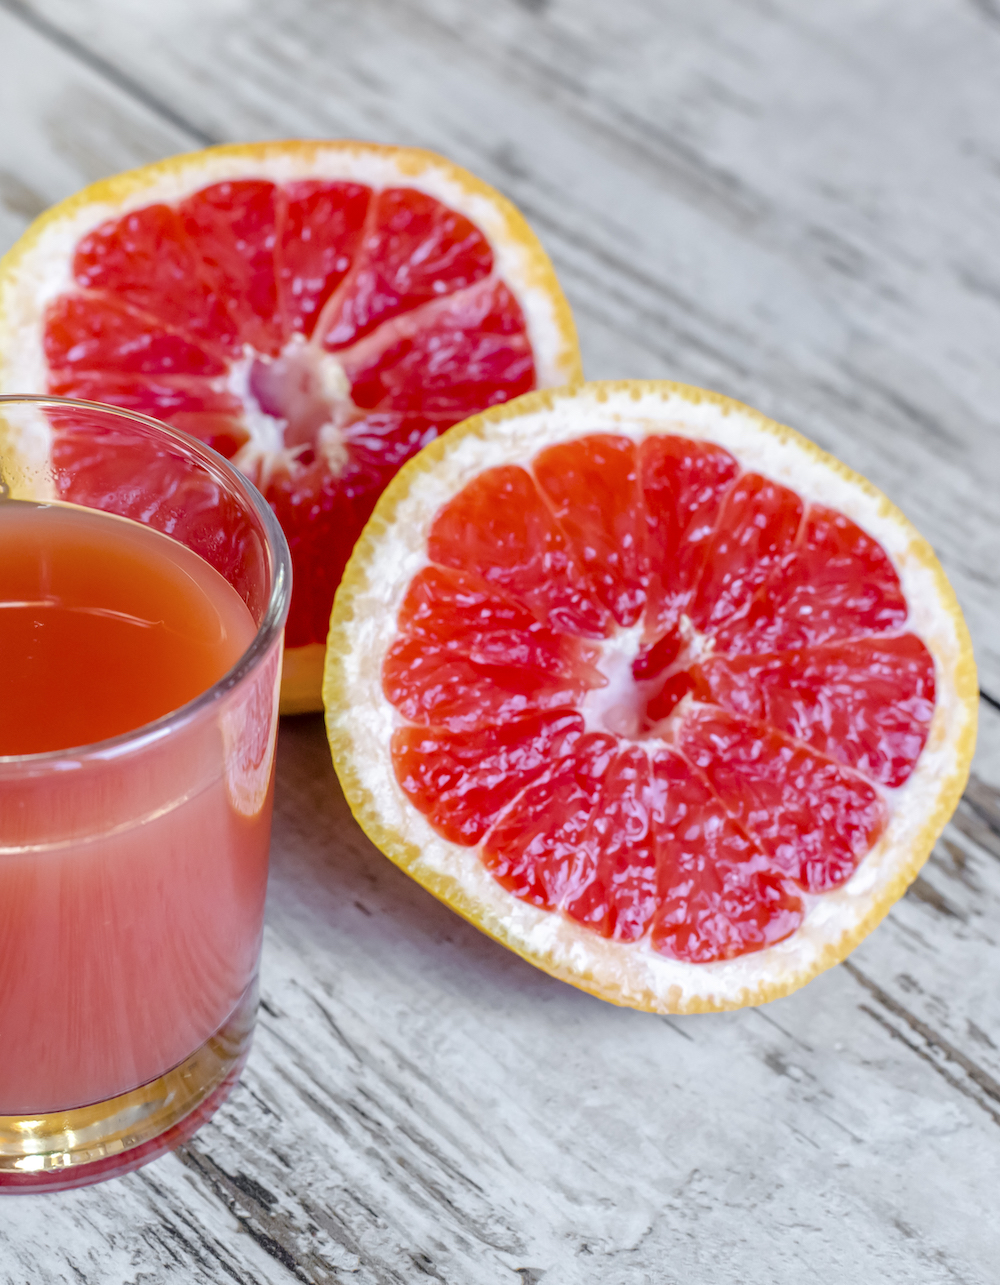 Sliced grapefruit and glass of grapefruit juice on wood